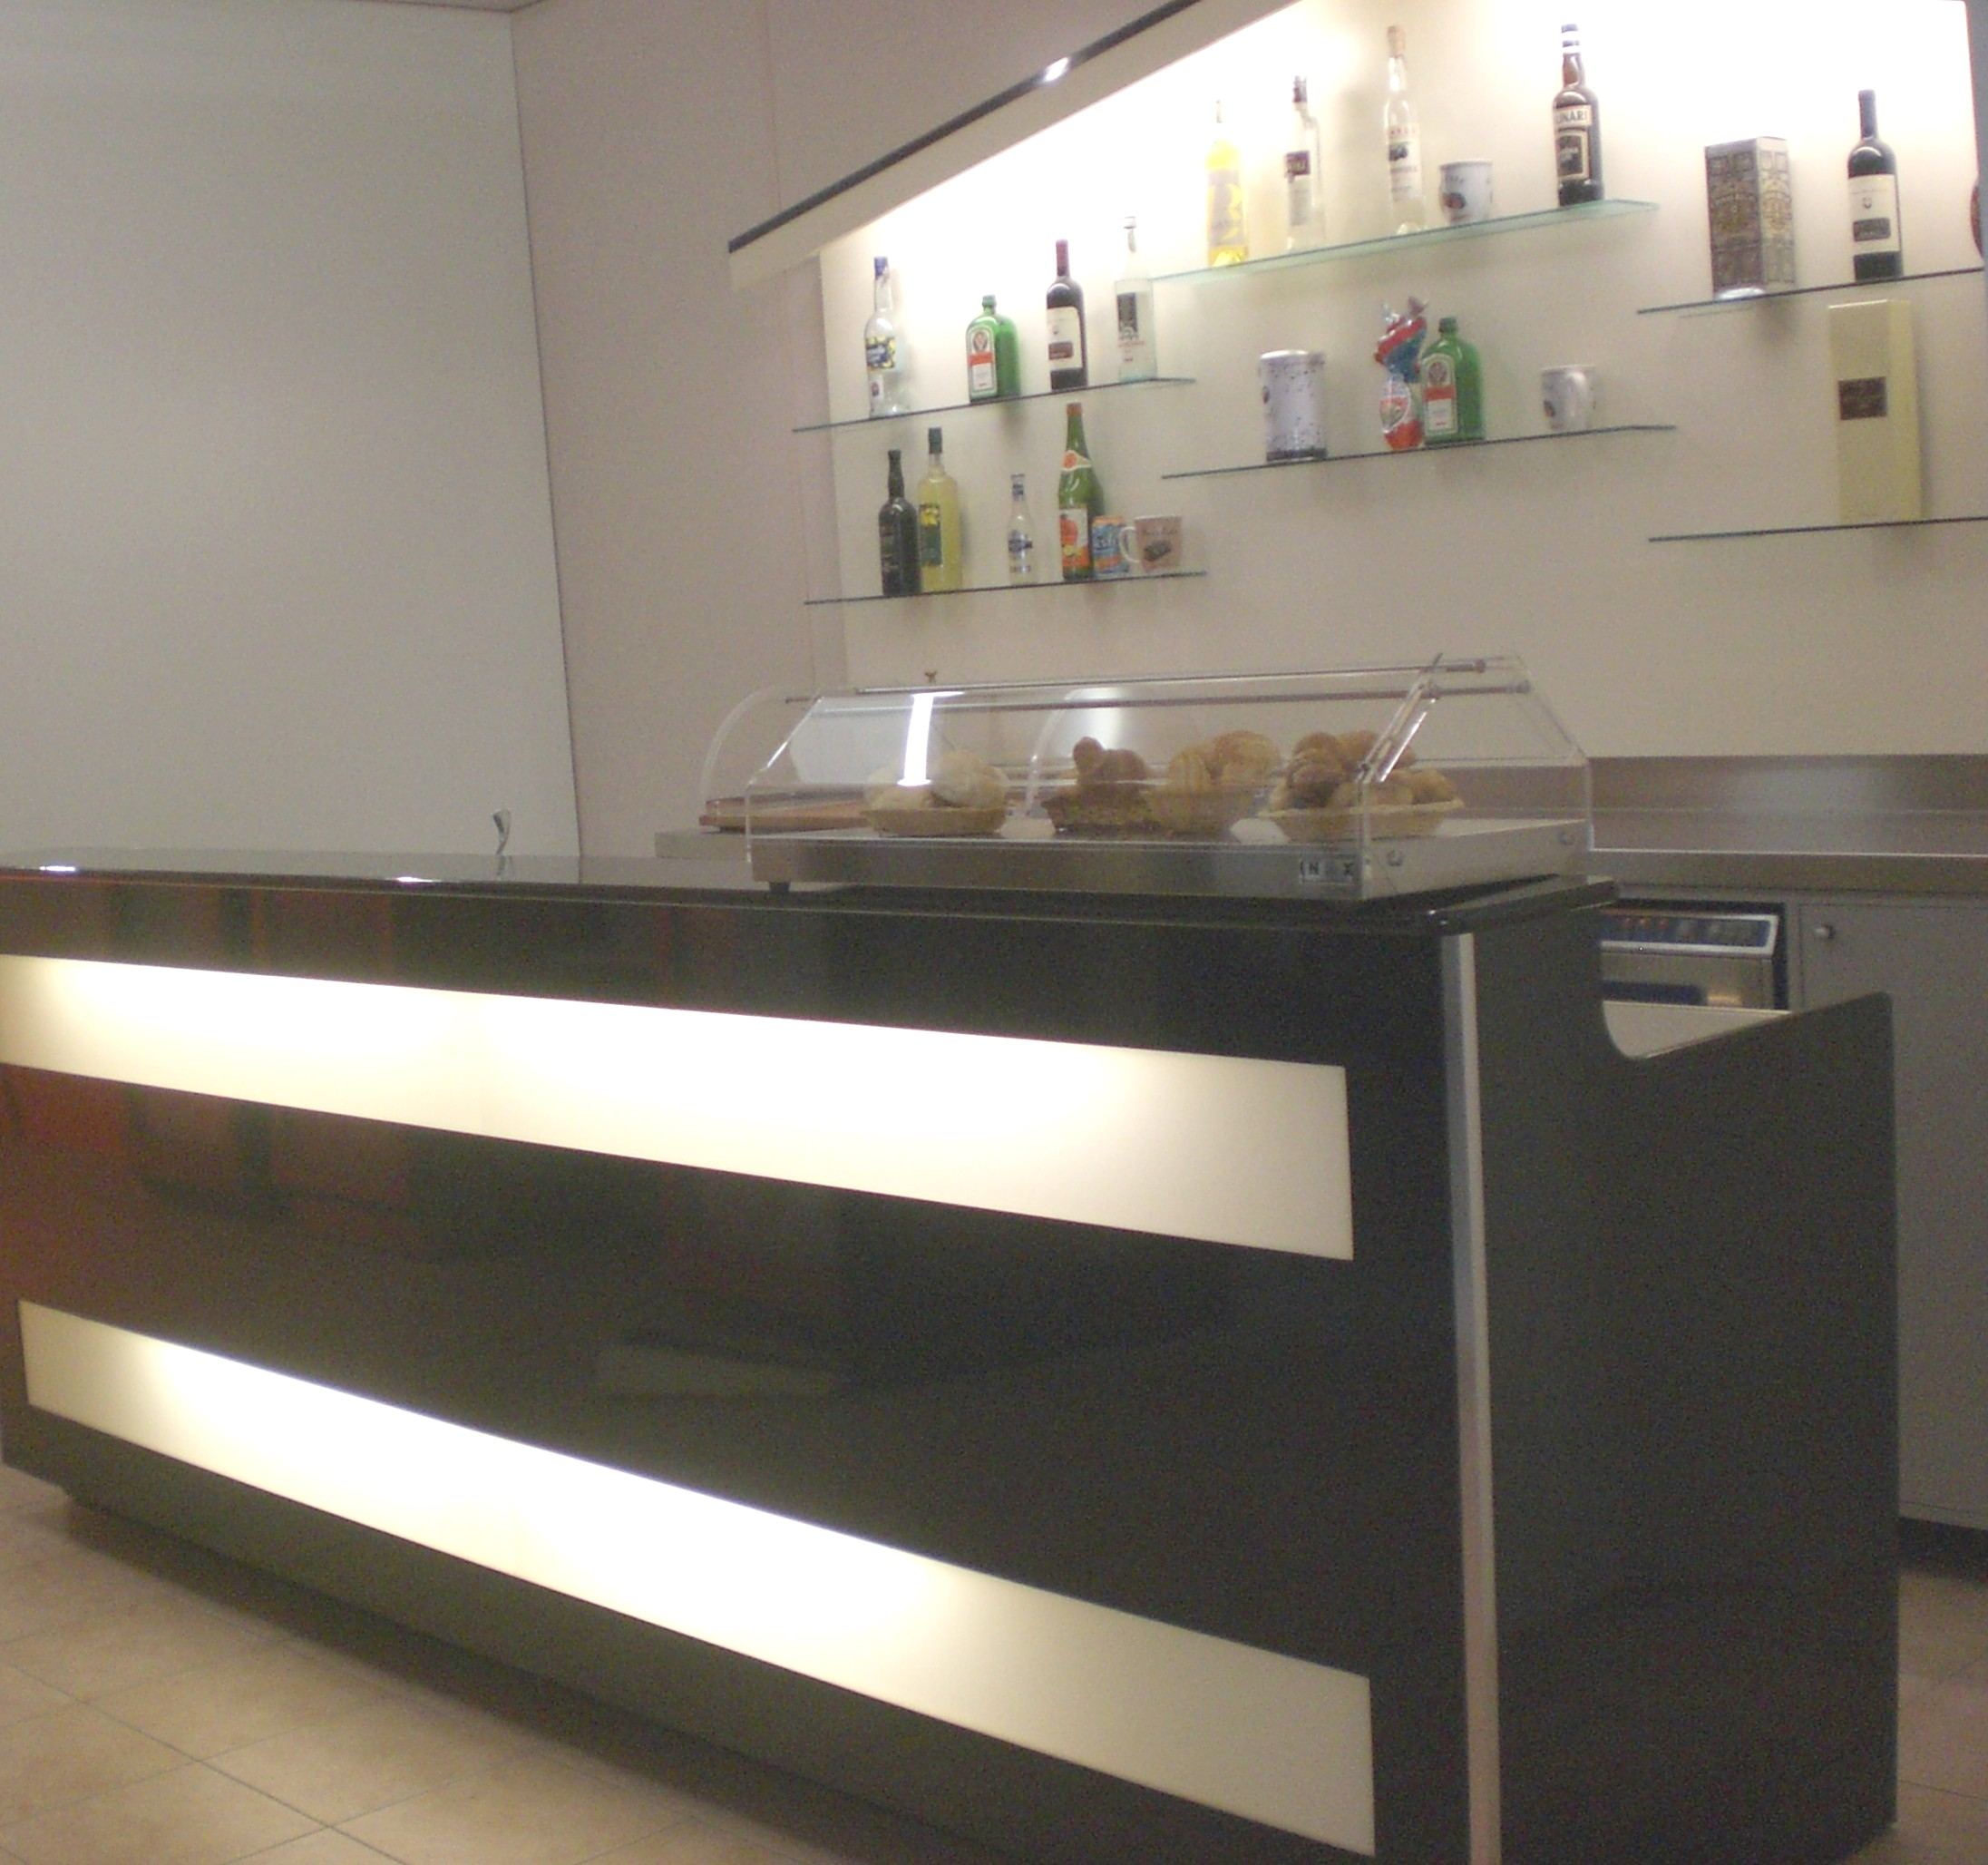 Banchi Bar, PREZZI Banchi Bar, Banconi Bar, Banchi Frigo ...